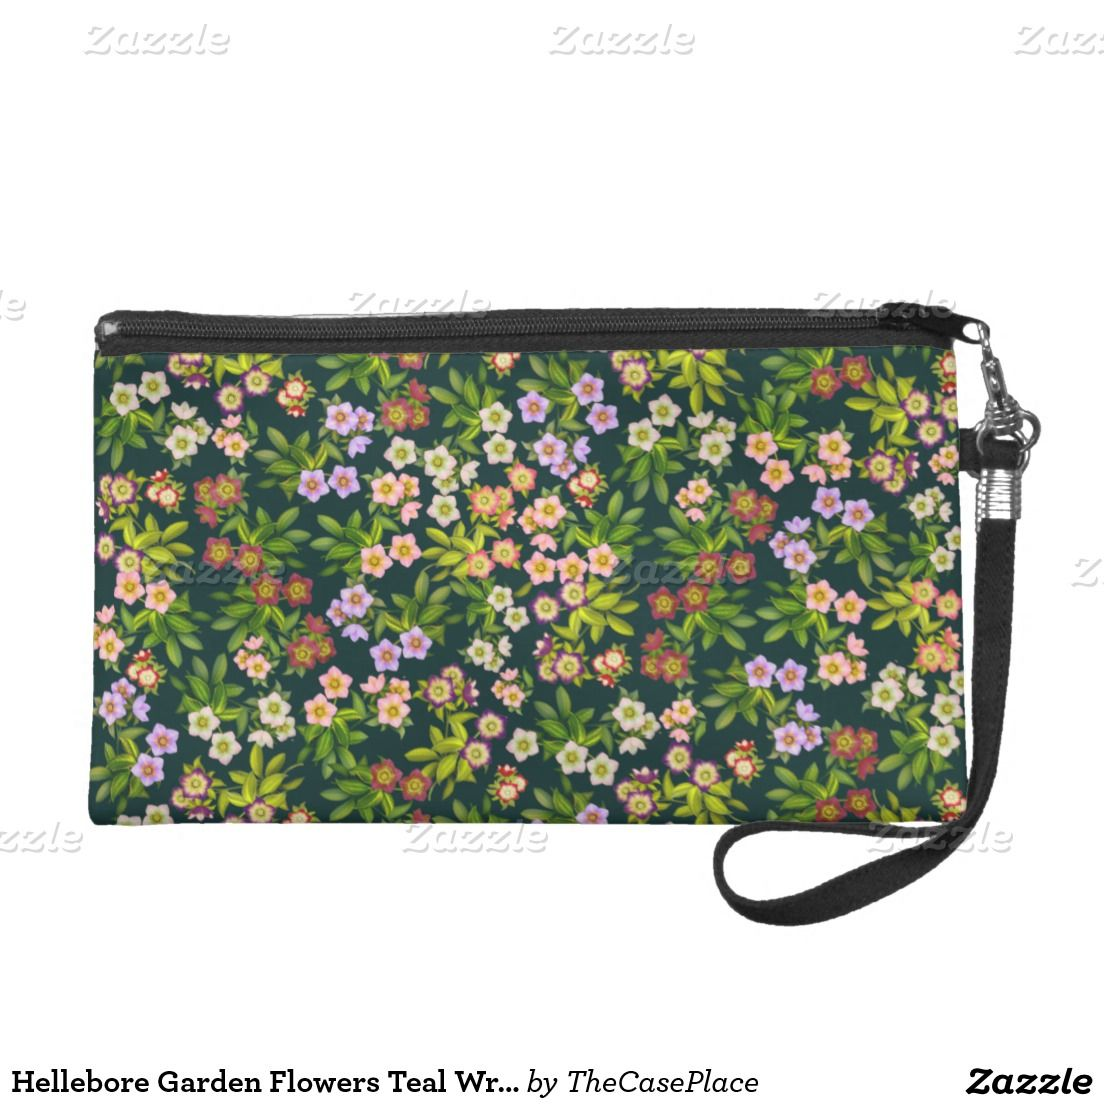 Hellebore Garden Flowers Teal Wristlet